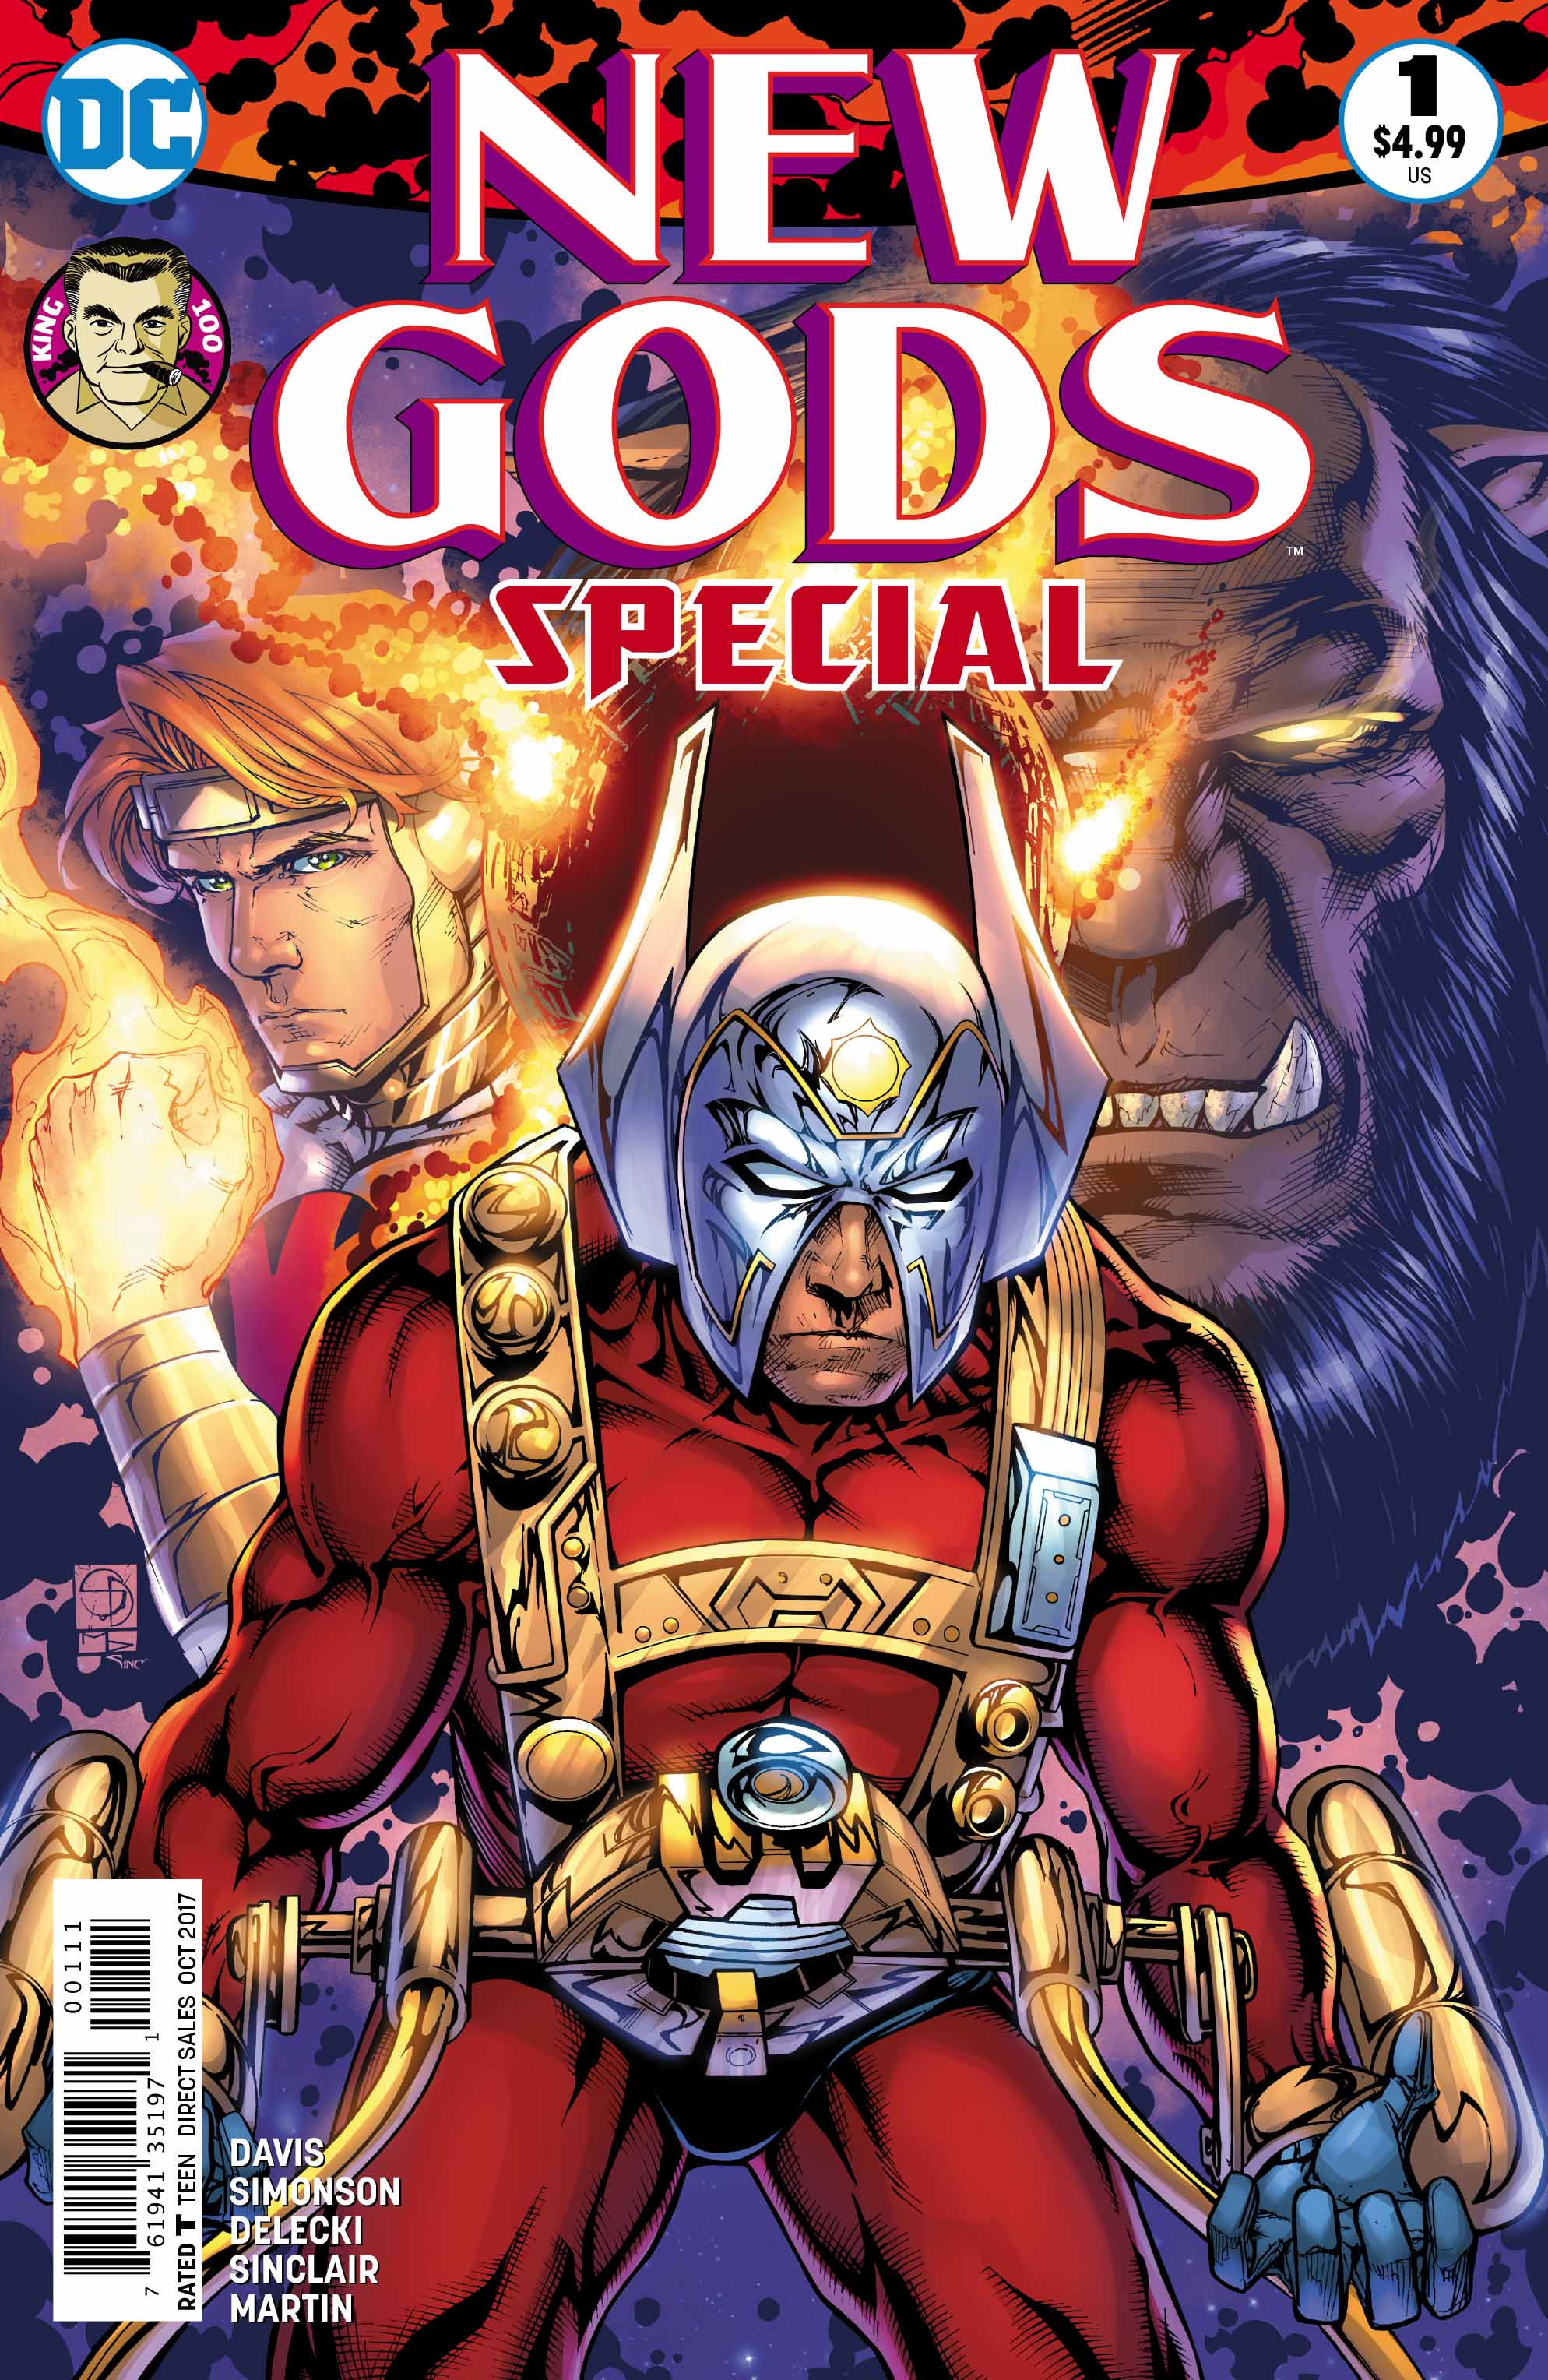 DC REBORN ROUND-UP: Jack Kirby's spirit is captured in the